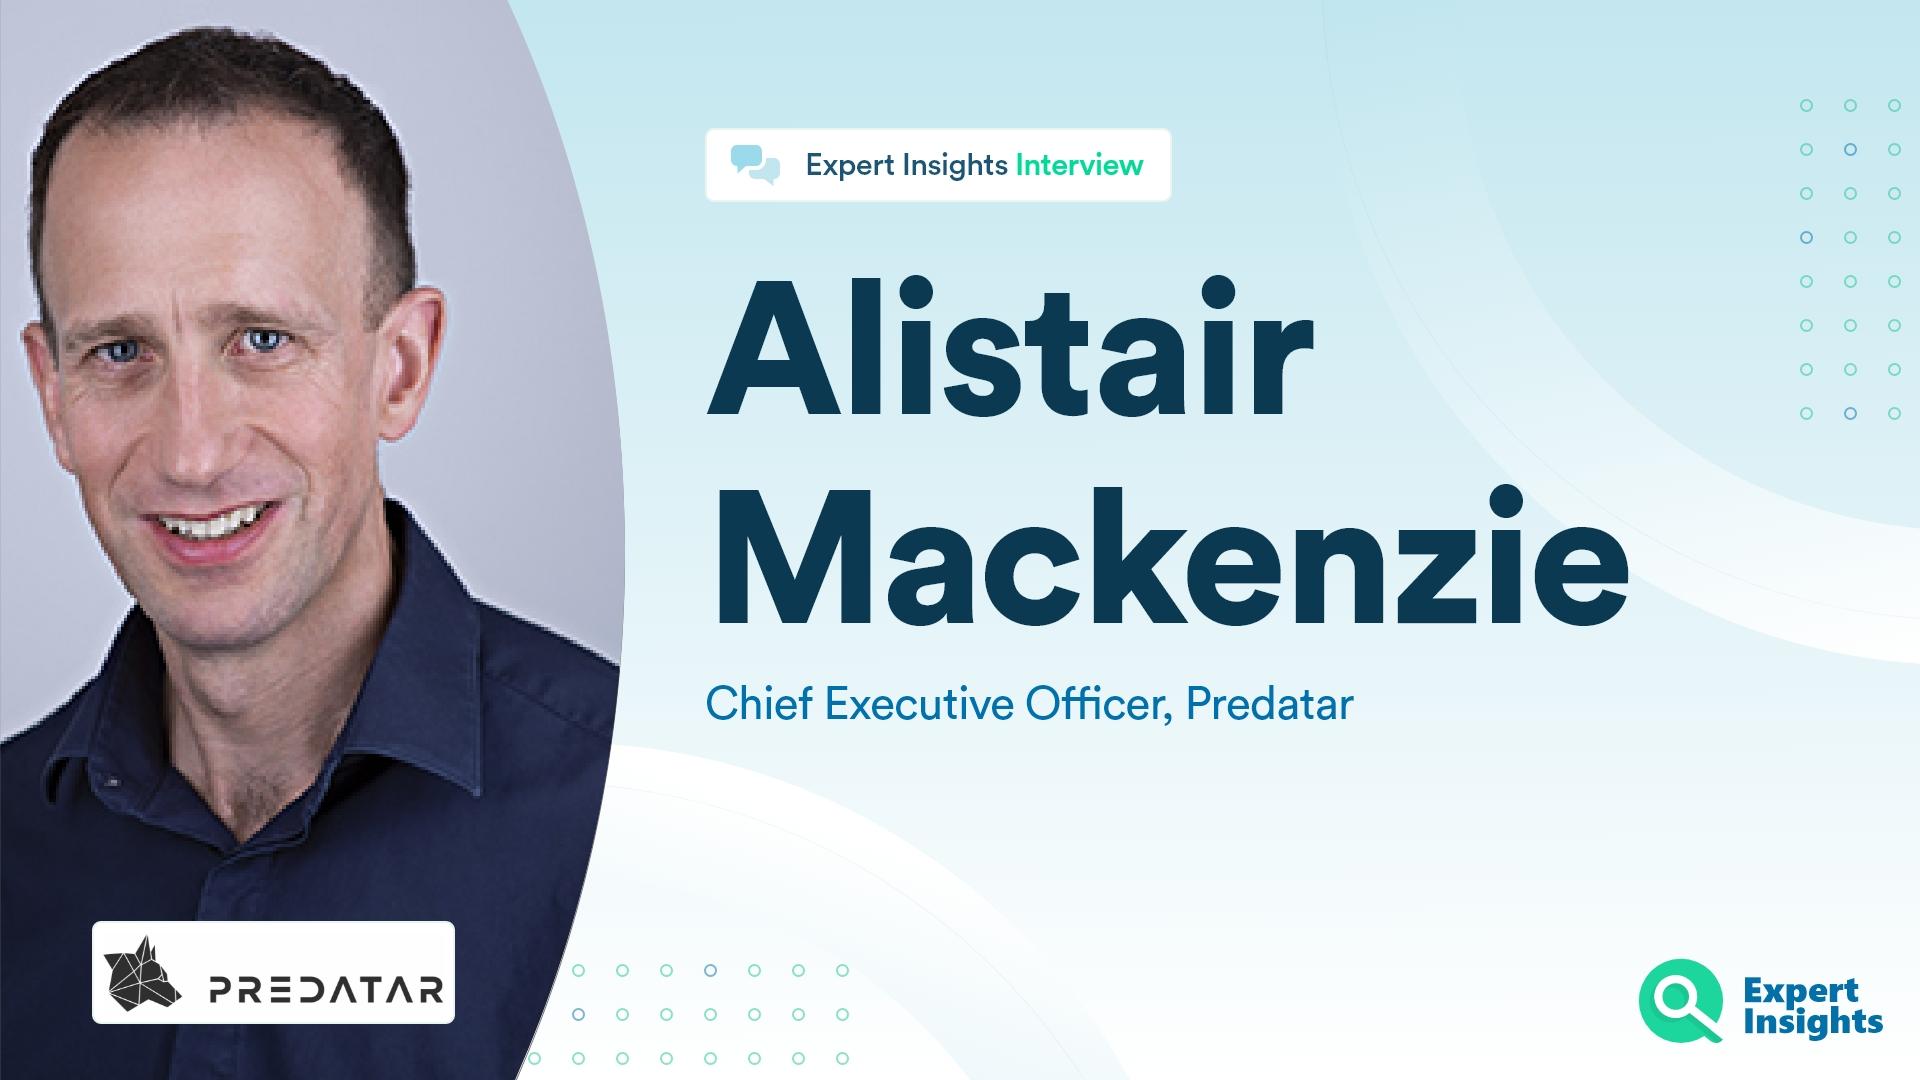 Expert Insights Interview With Alistair Mackenzie Of Predatar